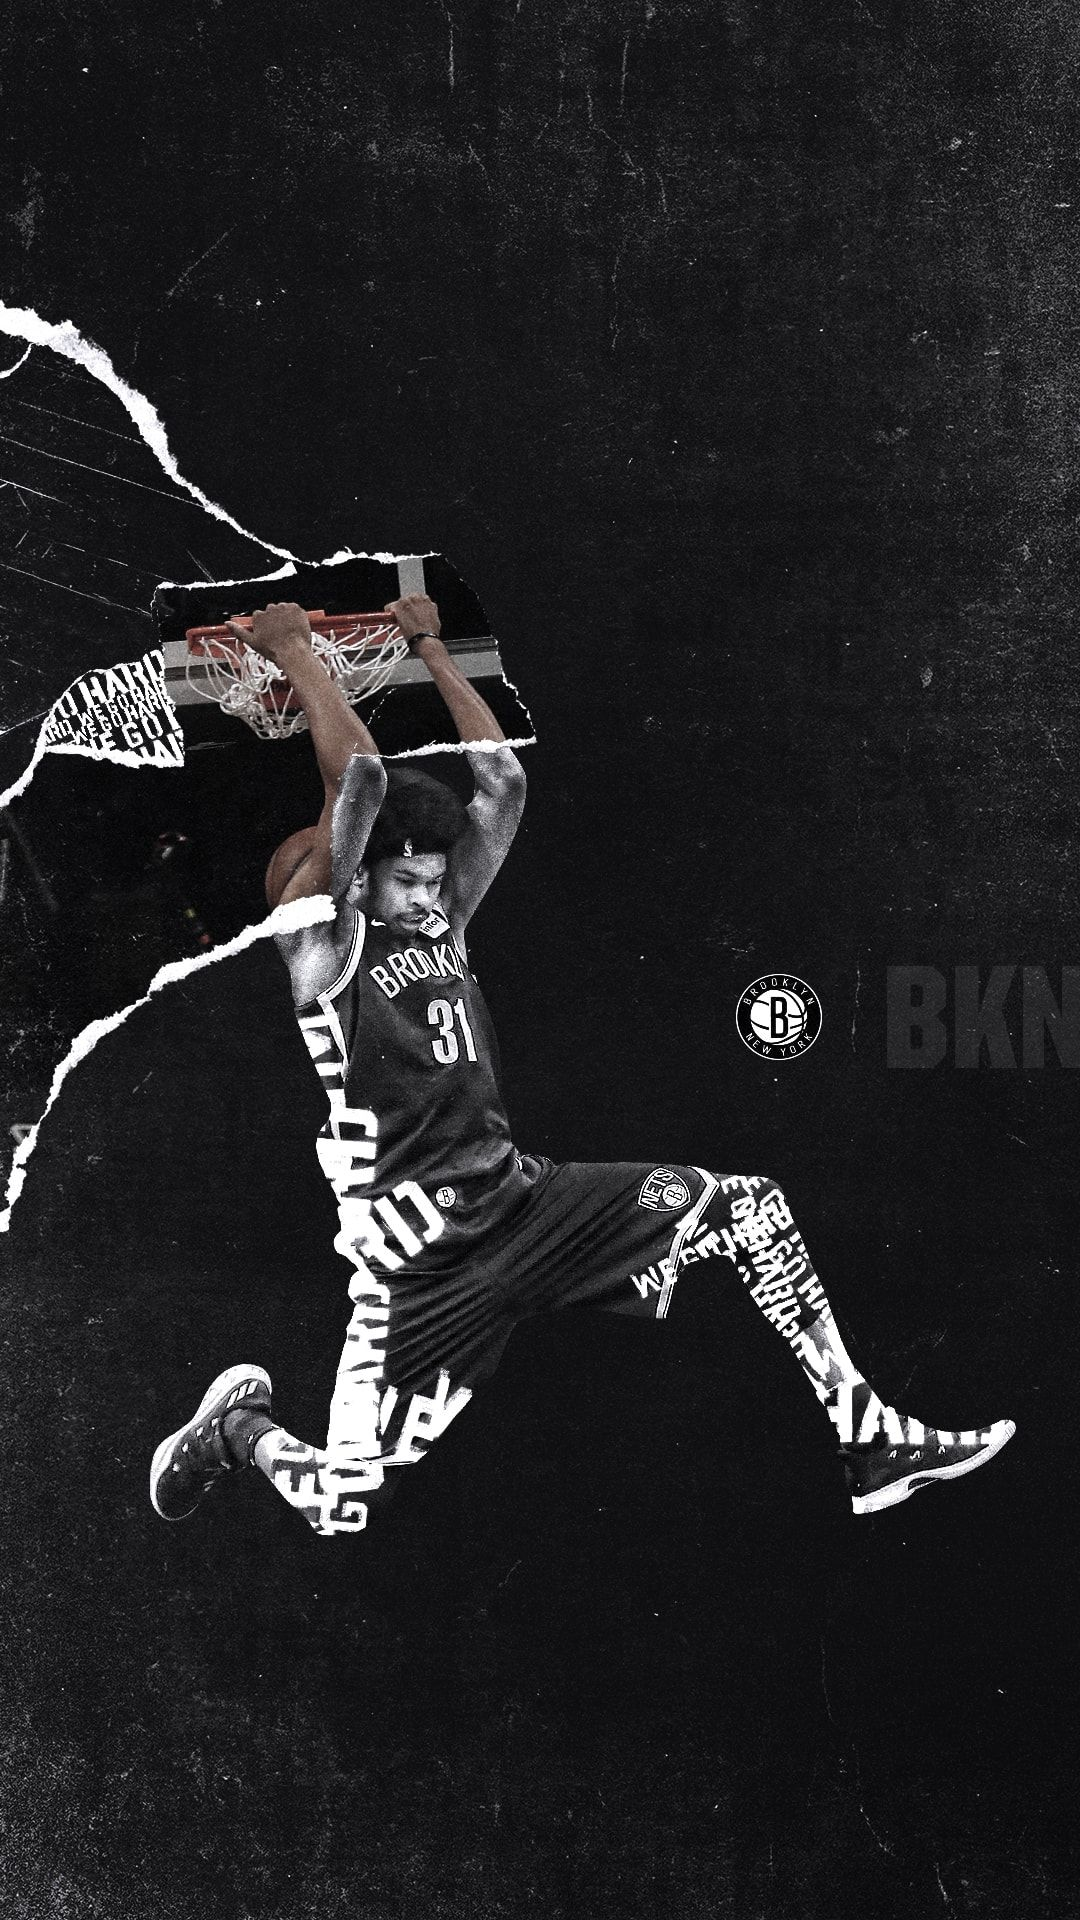 Basketball Wallpaper Best Basketball Wallpapers 2020 in